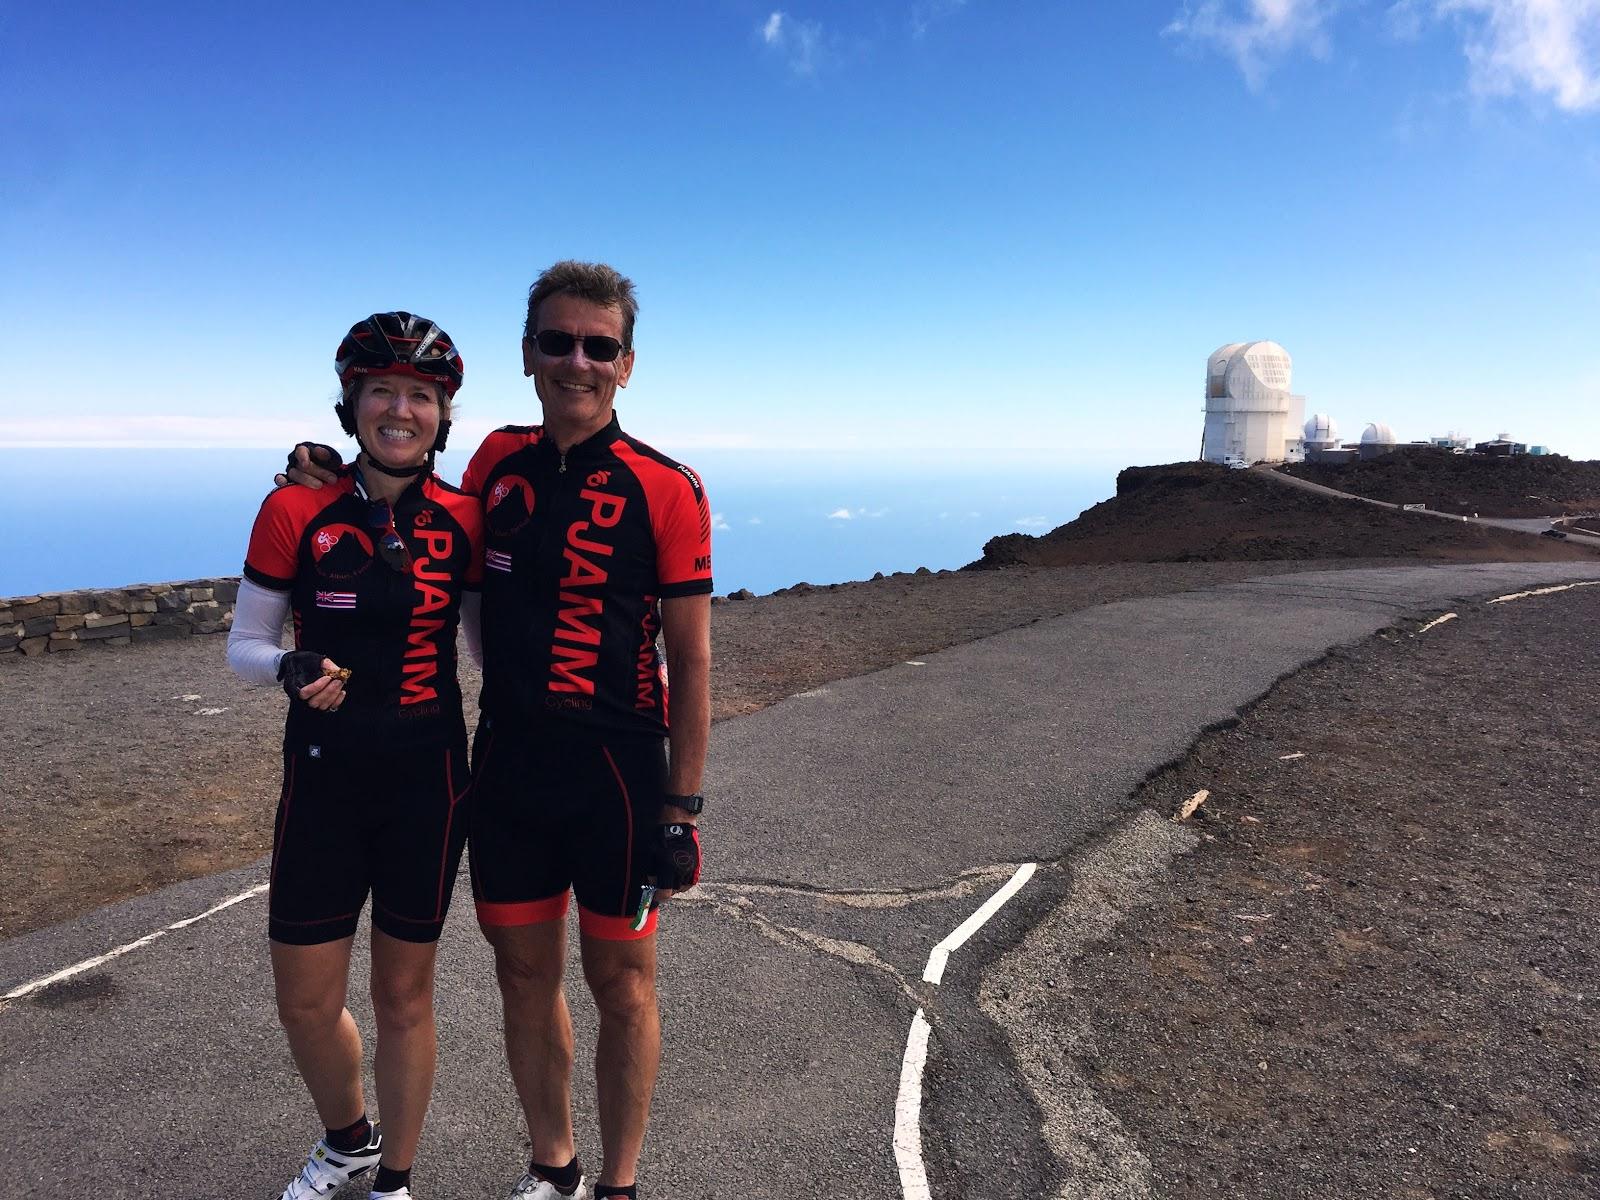 Best bike climb in US - cyclists, observatories, sky, ocean, clouds